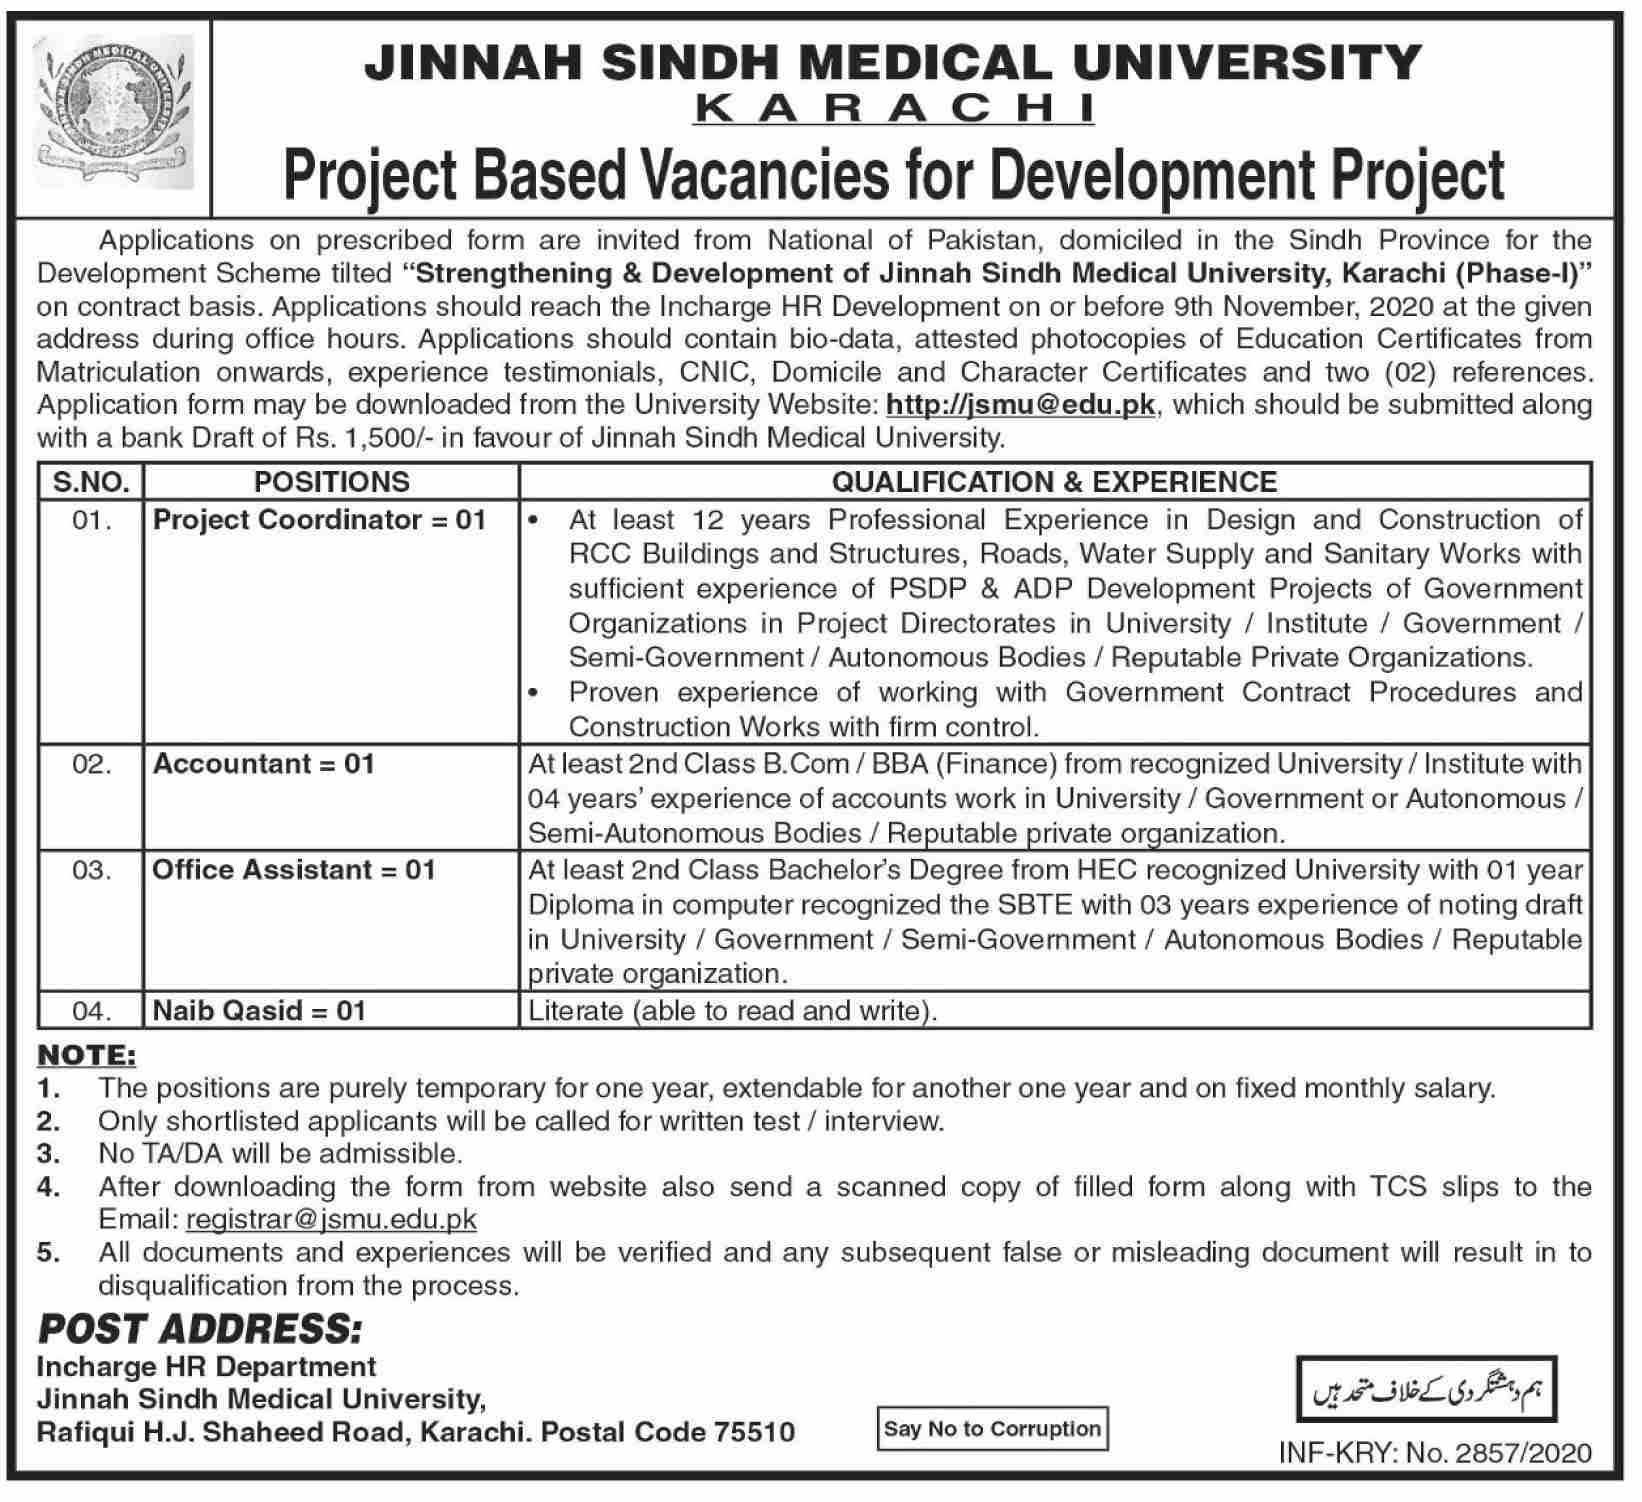 Jinnah Sindh Medical University JSMU Jobs Oct 2020